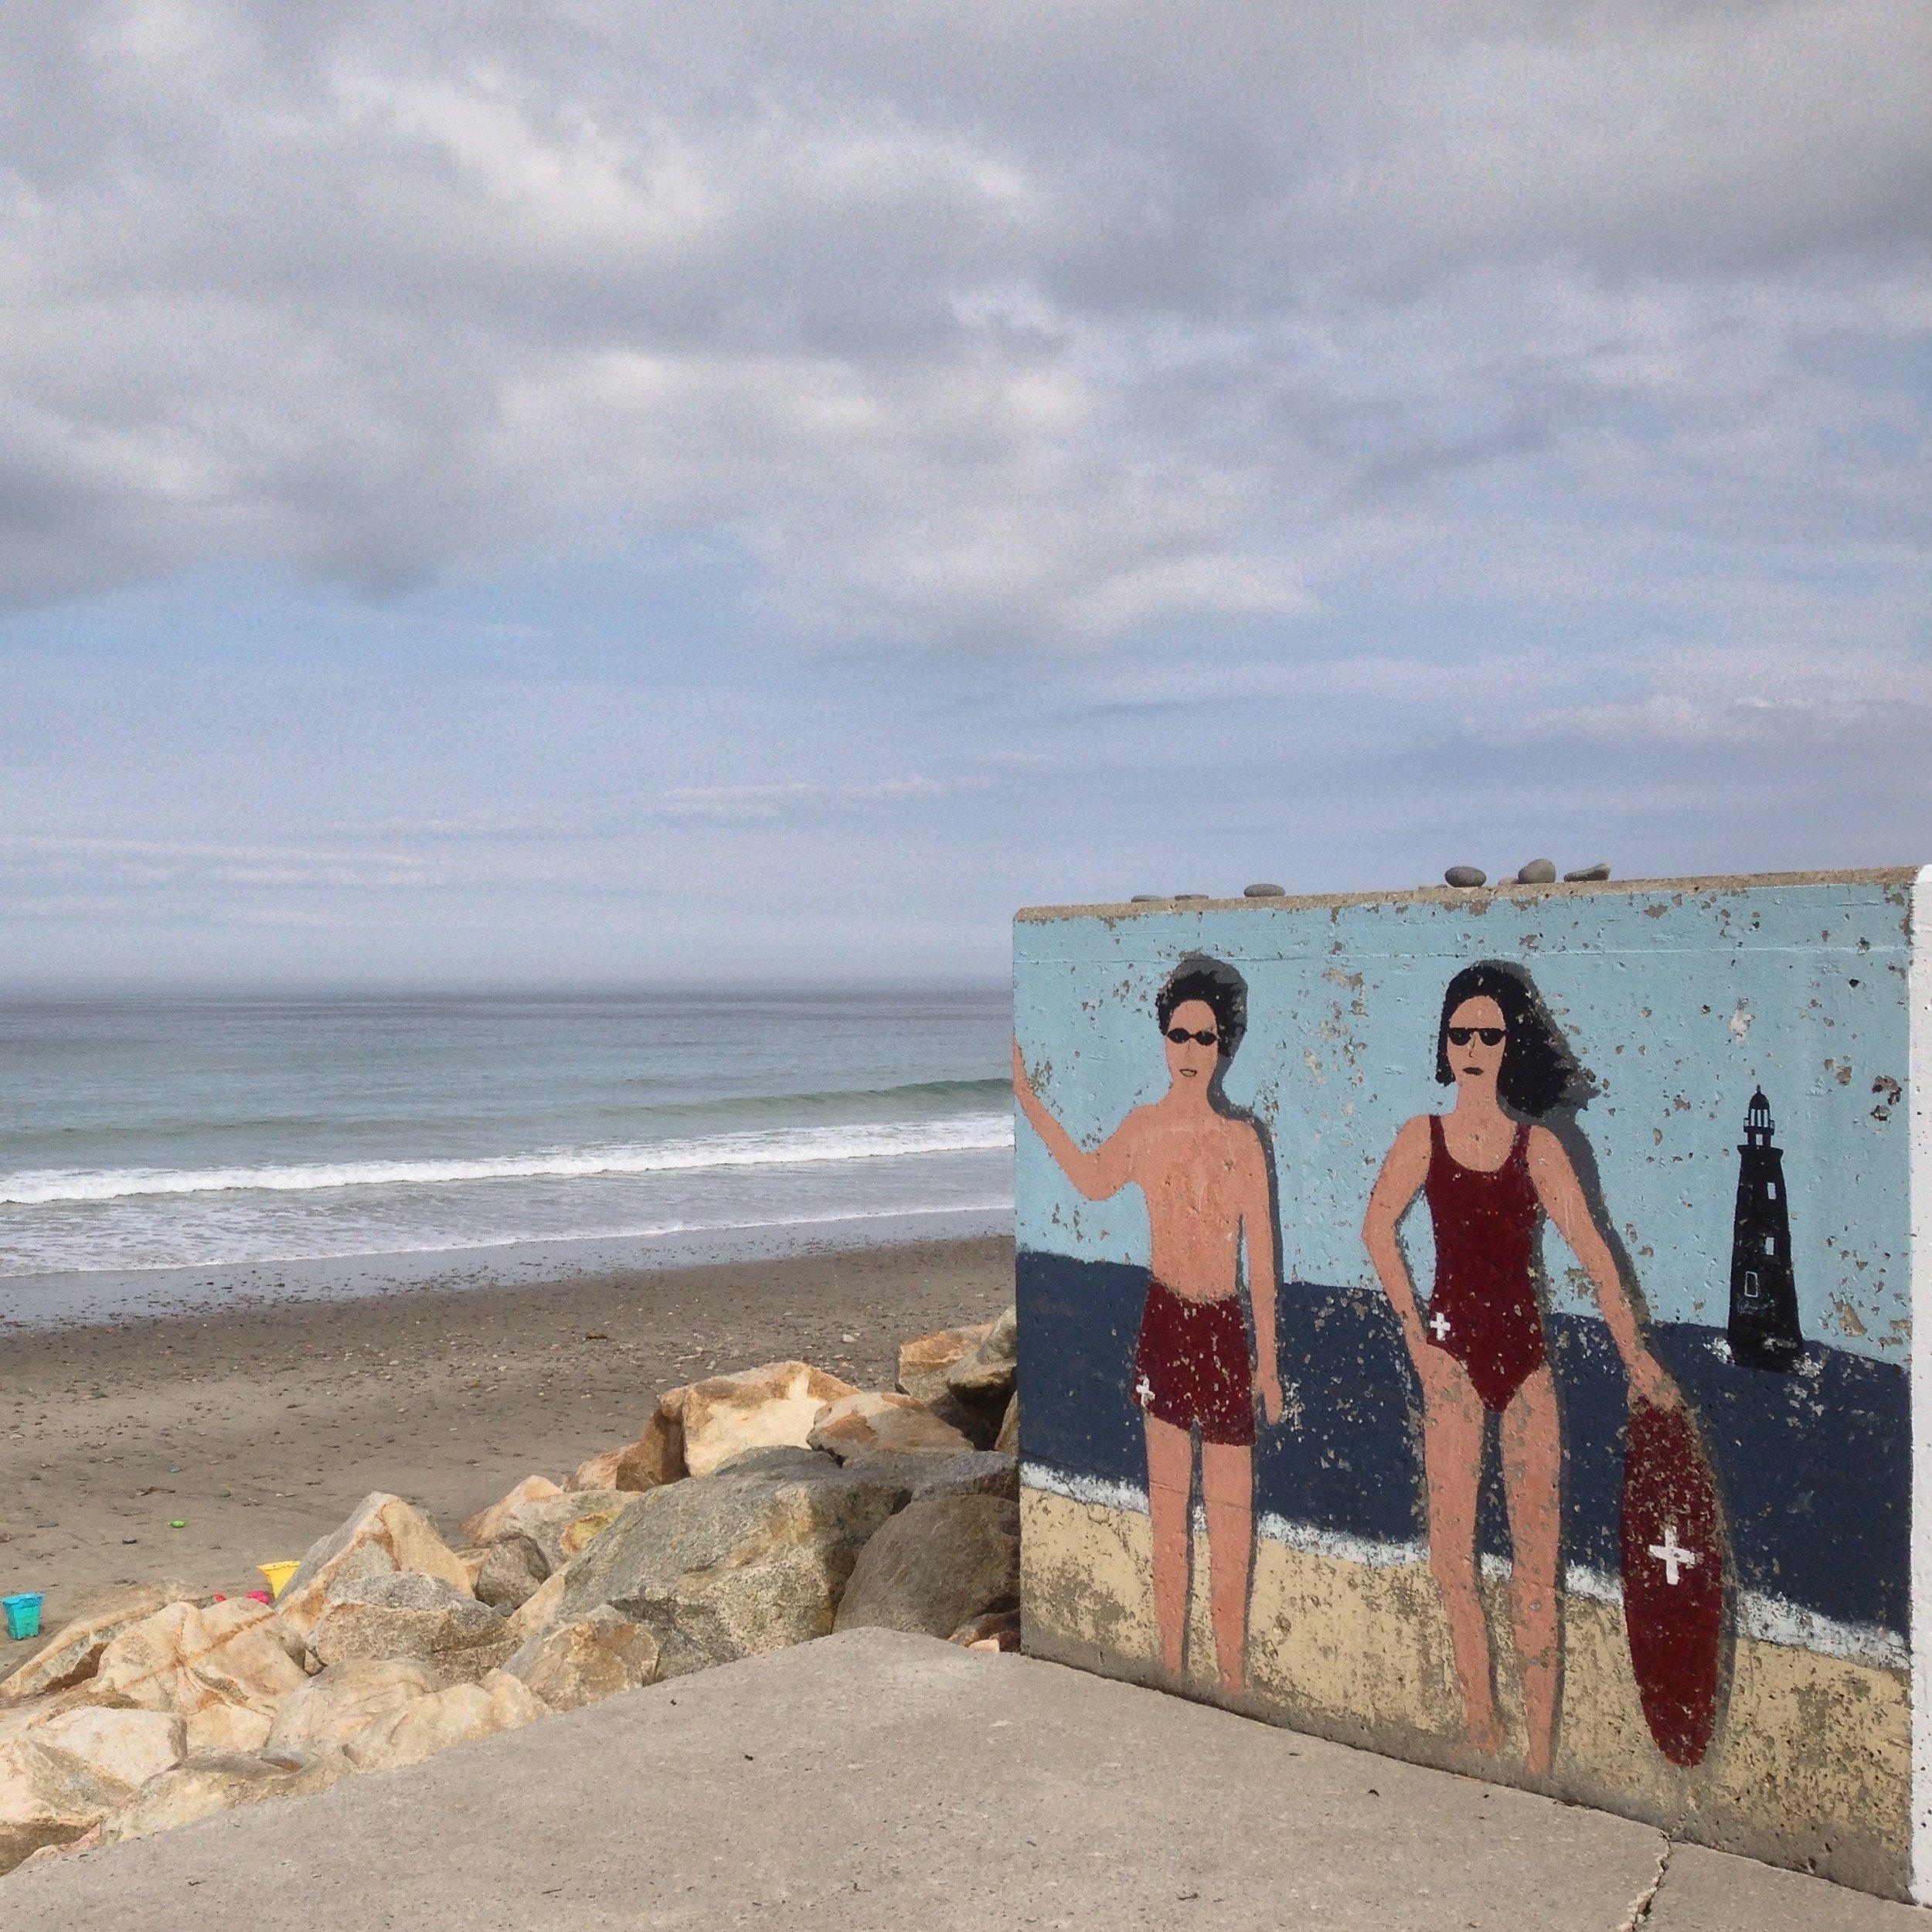 32-Minot Beach, Minot MA, Instagram Square